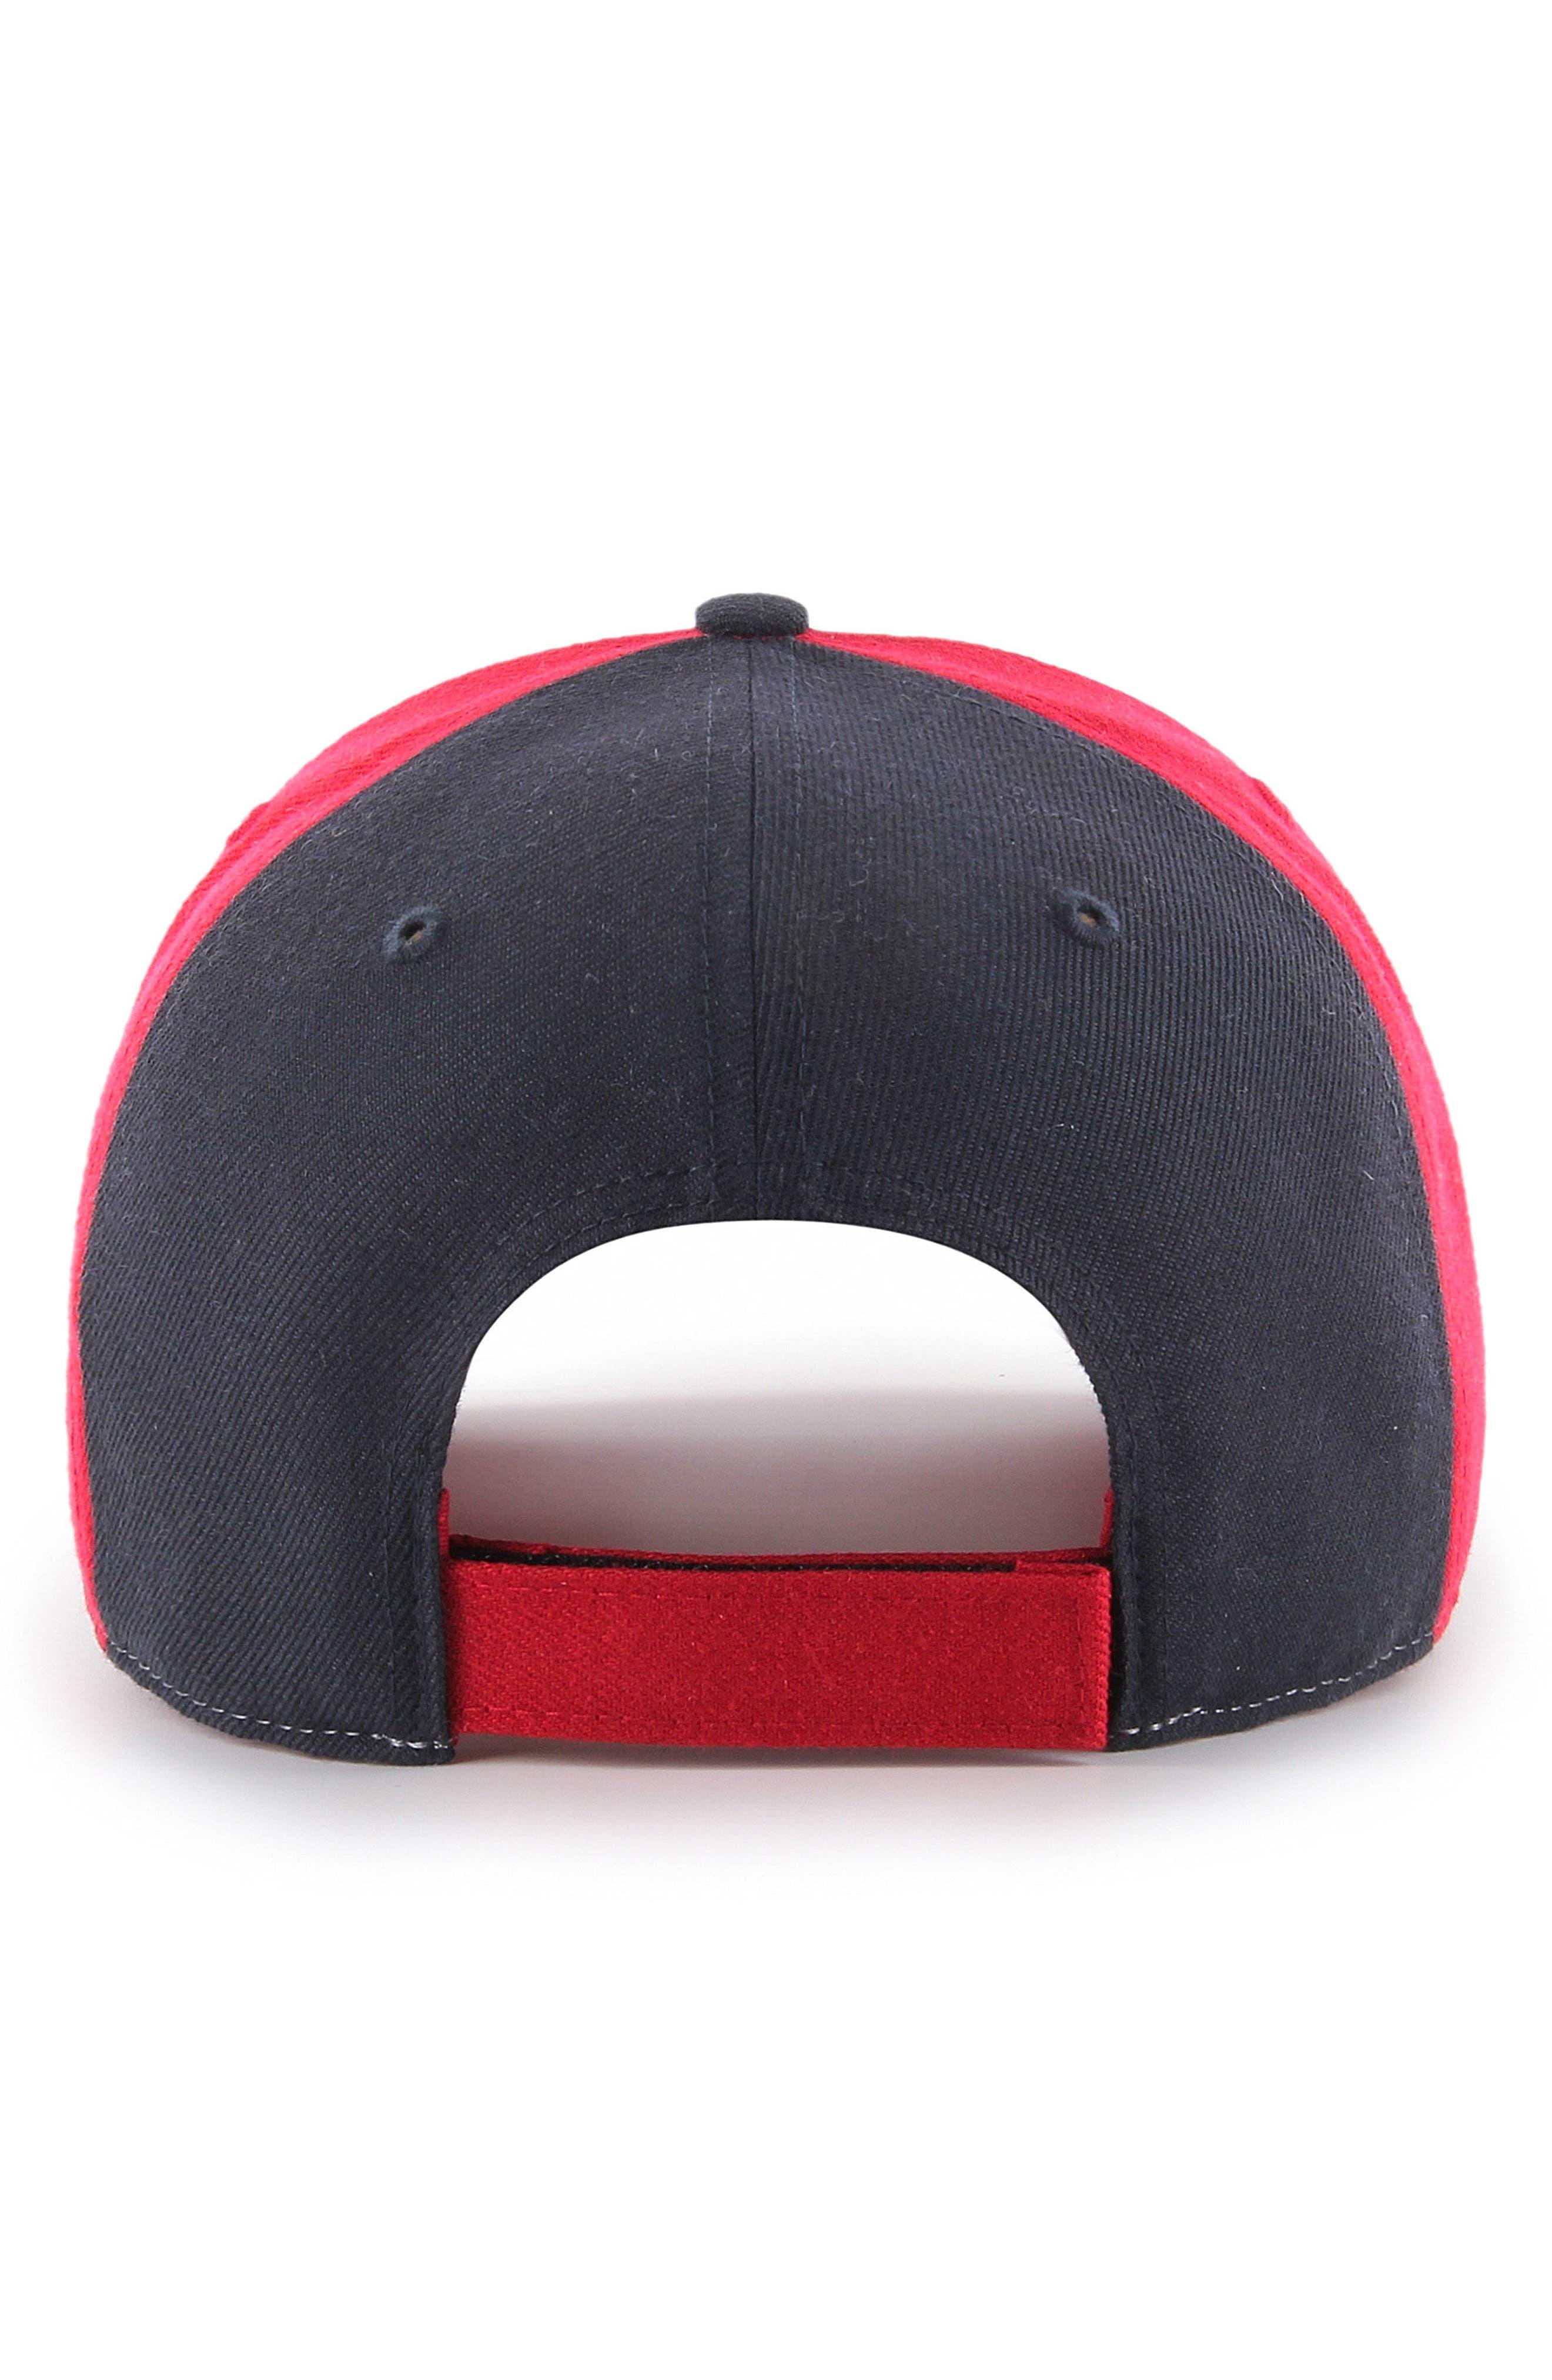 Reresto MLB Ball Cap,                             Alternate thumbnail 2, color,                             Dodgers